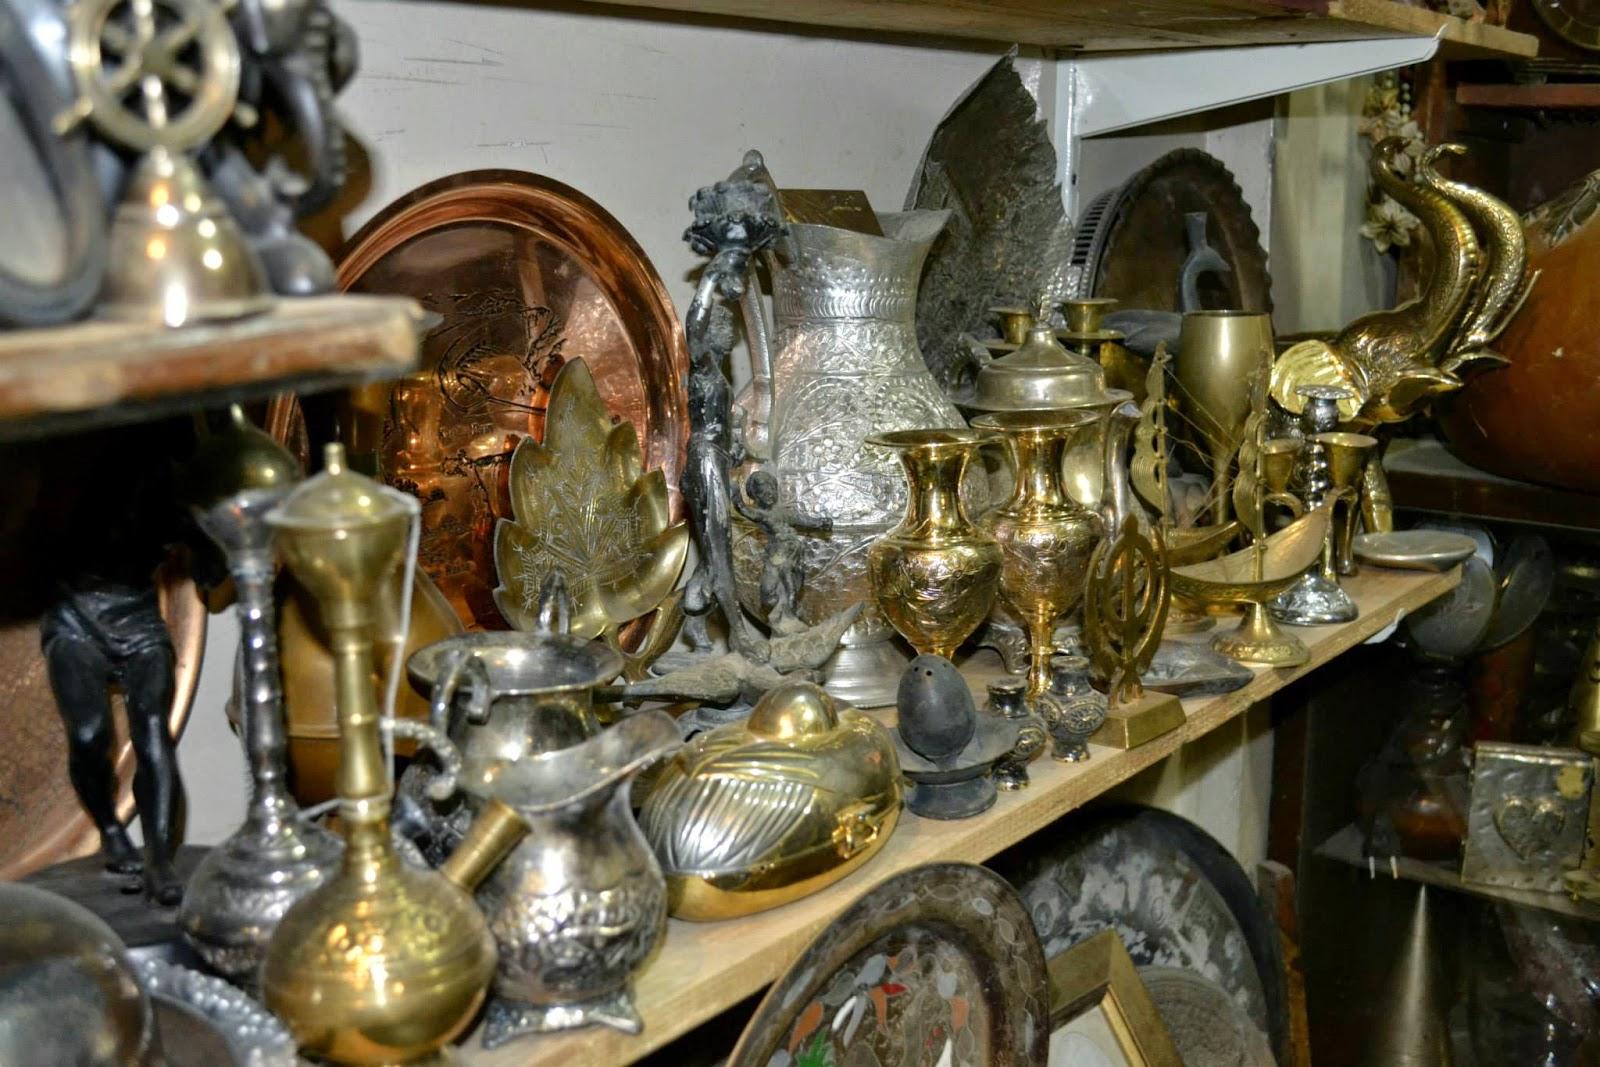 antique vases and silverware